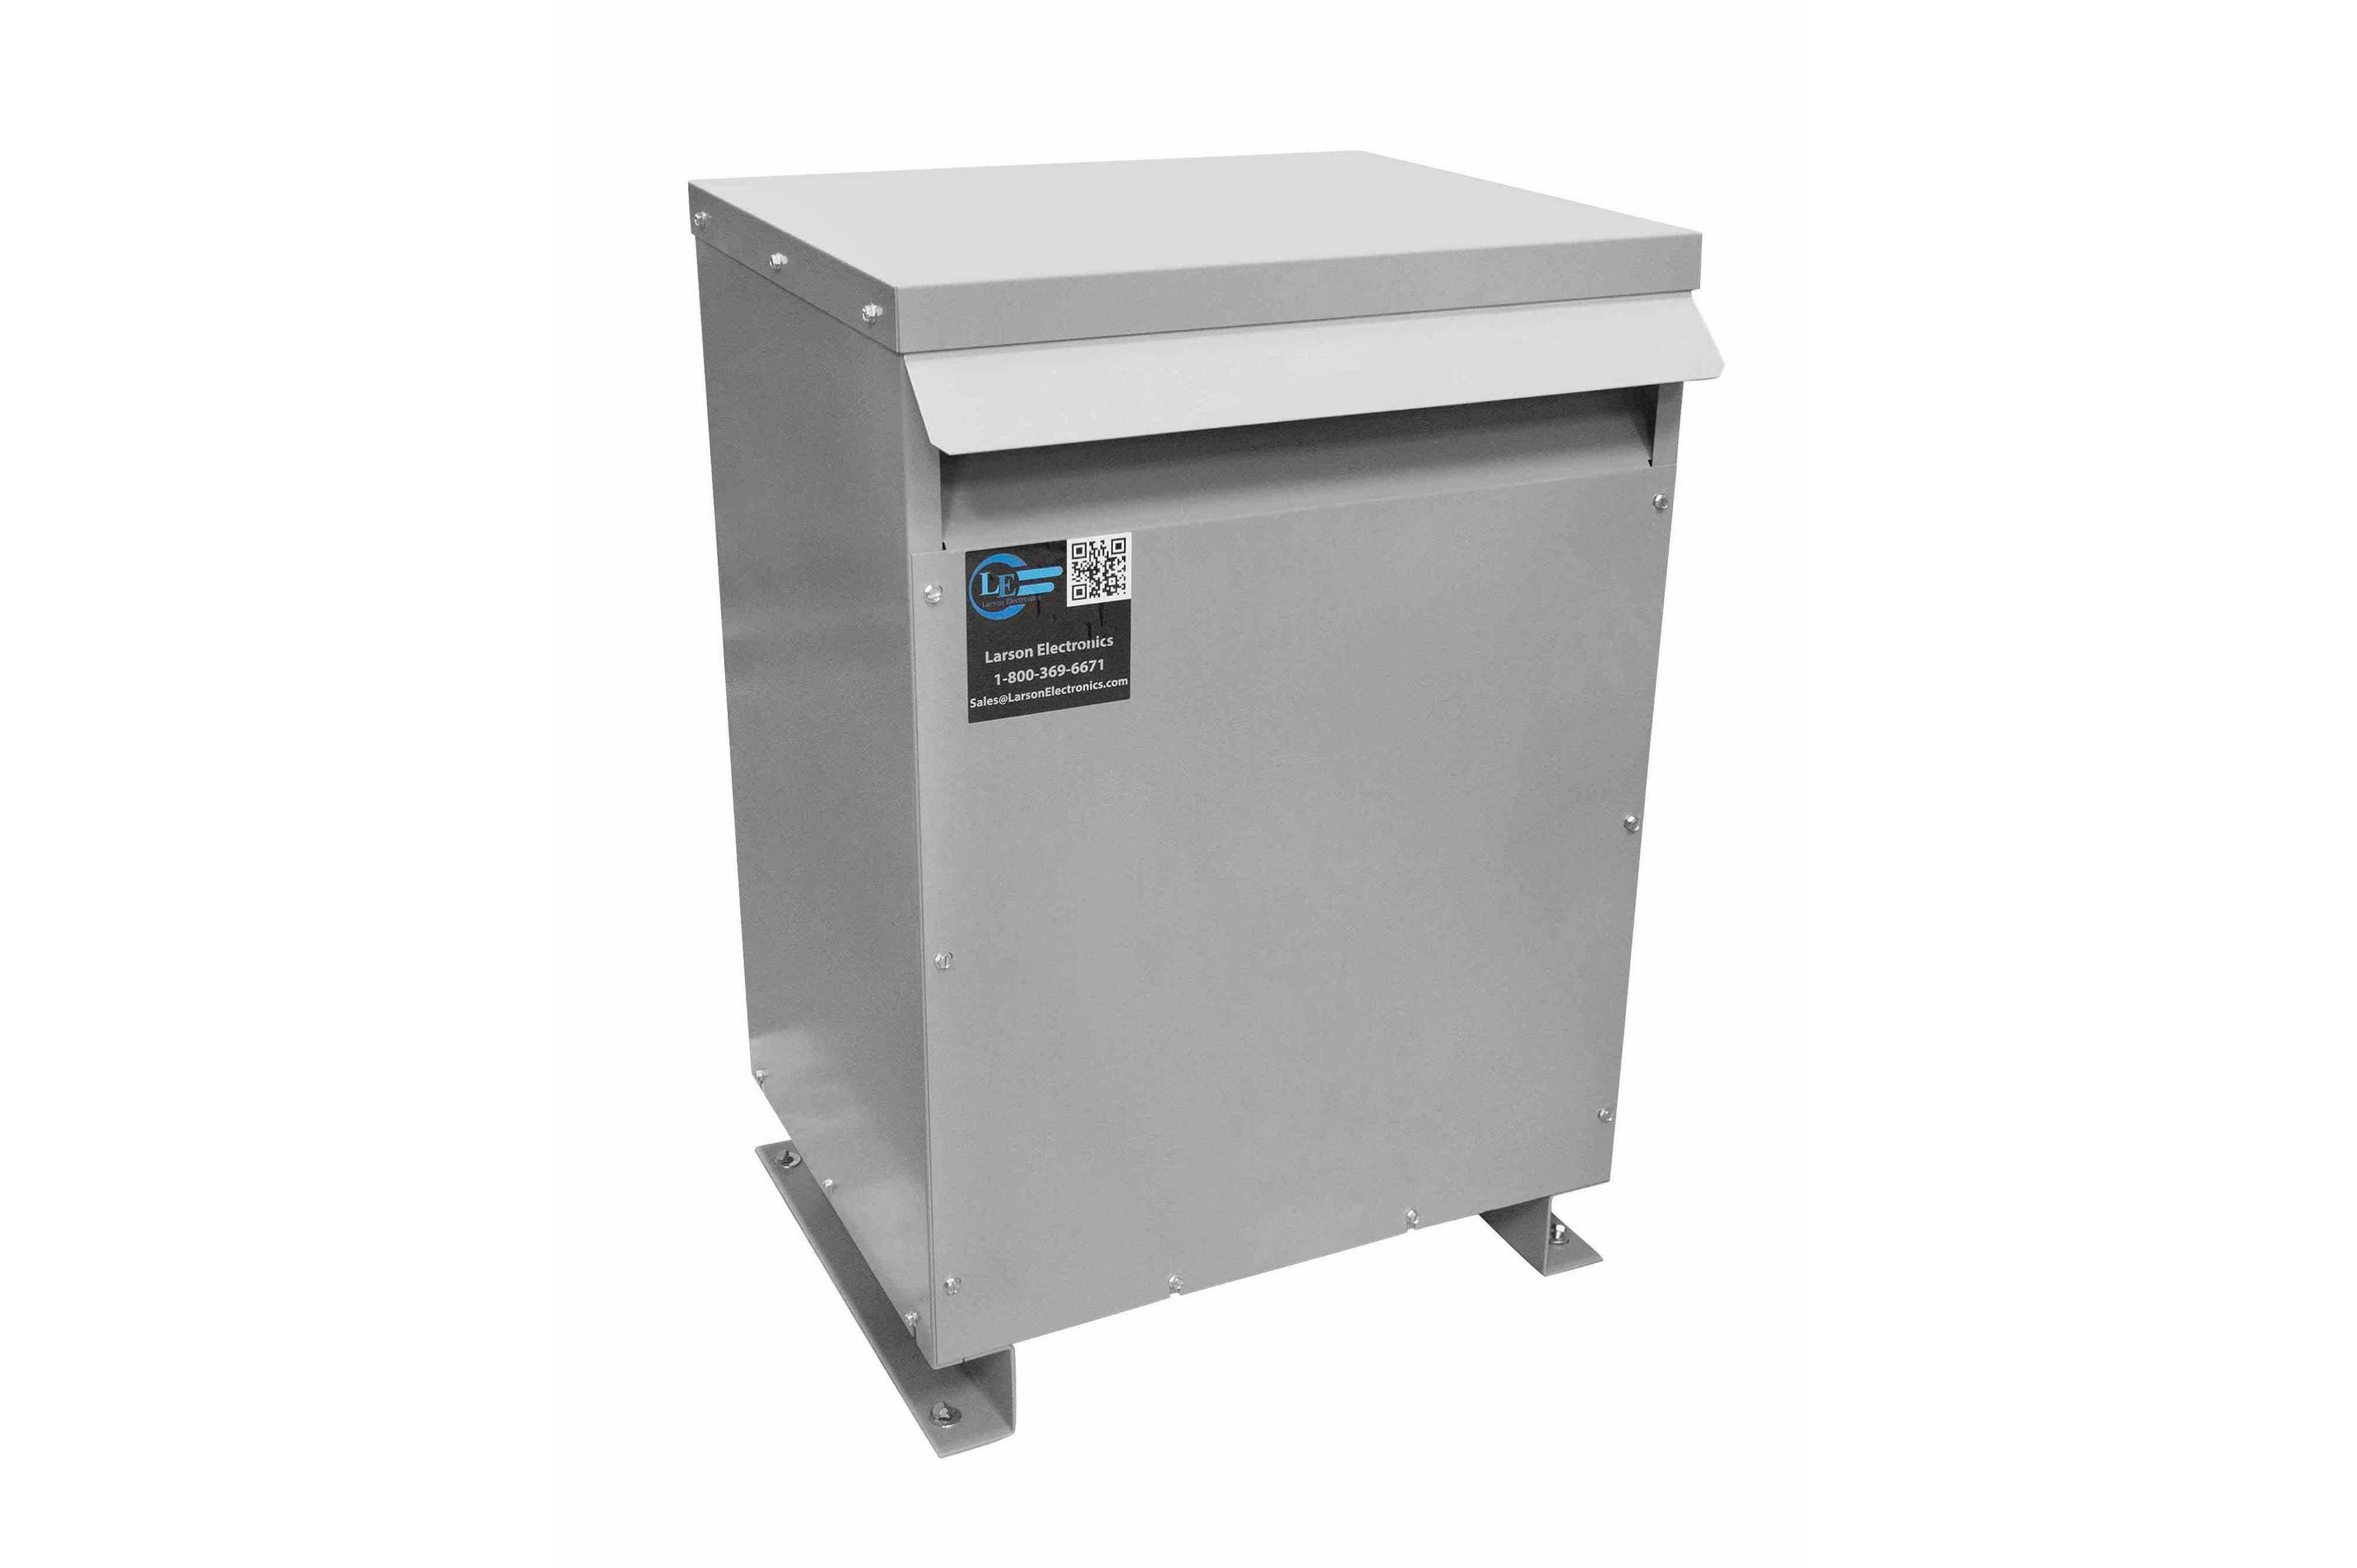 38 kVA 3PH Isolation Transformer, 480V Wye Primary, 380Y/220 Wye-N Secondary, N3R, Ventilated, 60 Hz